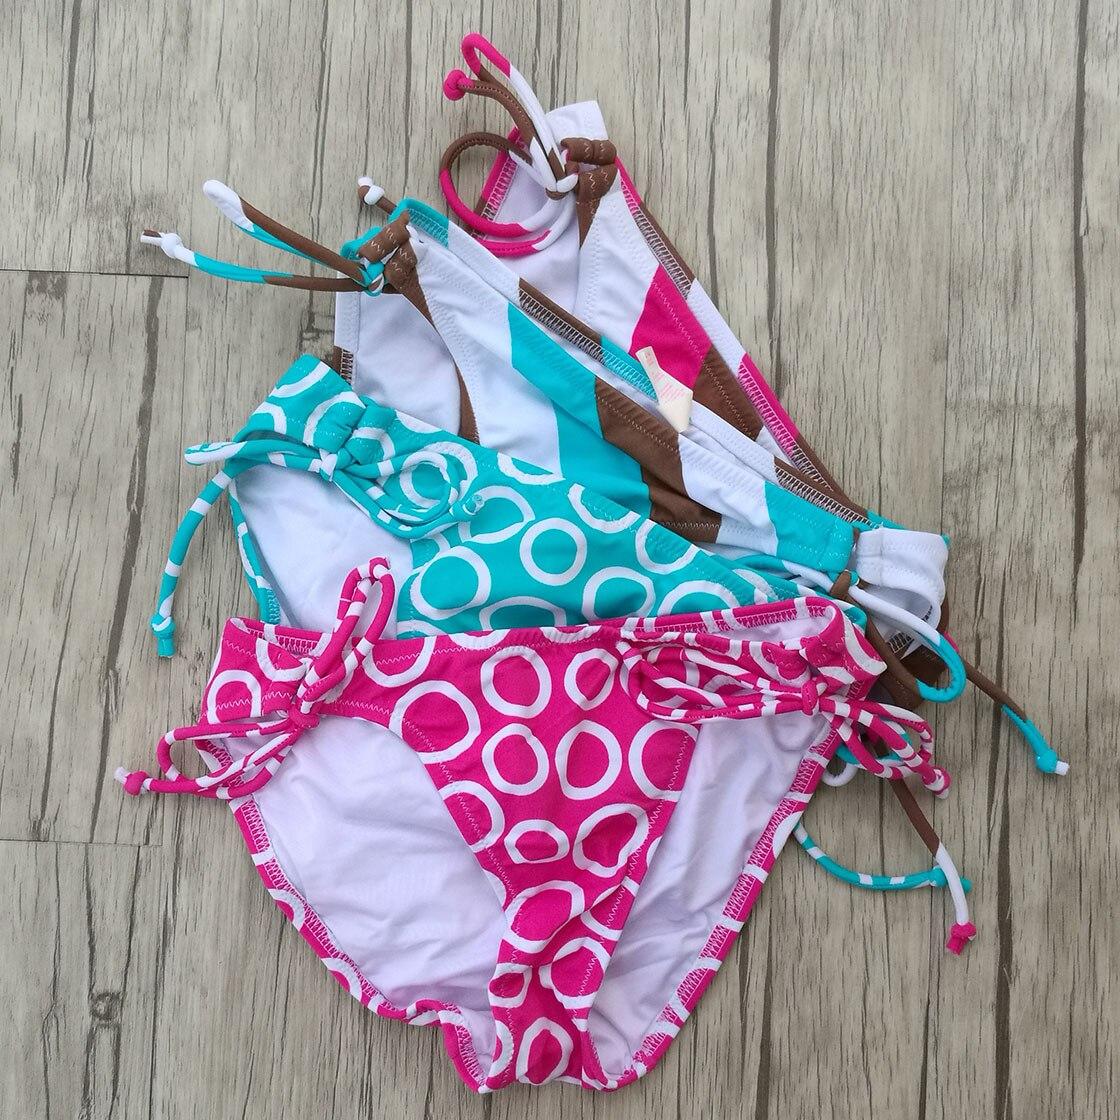 Designer Zwembroek.Vrouw Bikini Bottom Zwembroek Zwemmen Pak Spriped Blue Dot Roze